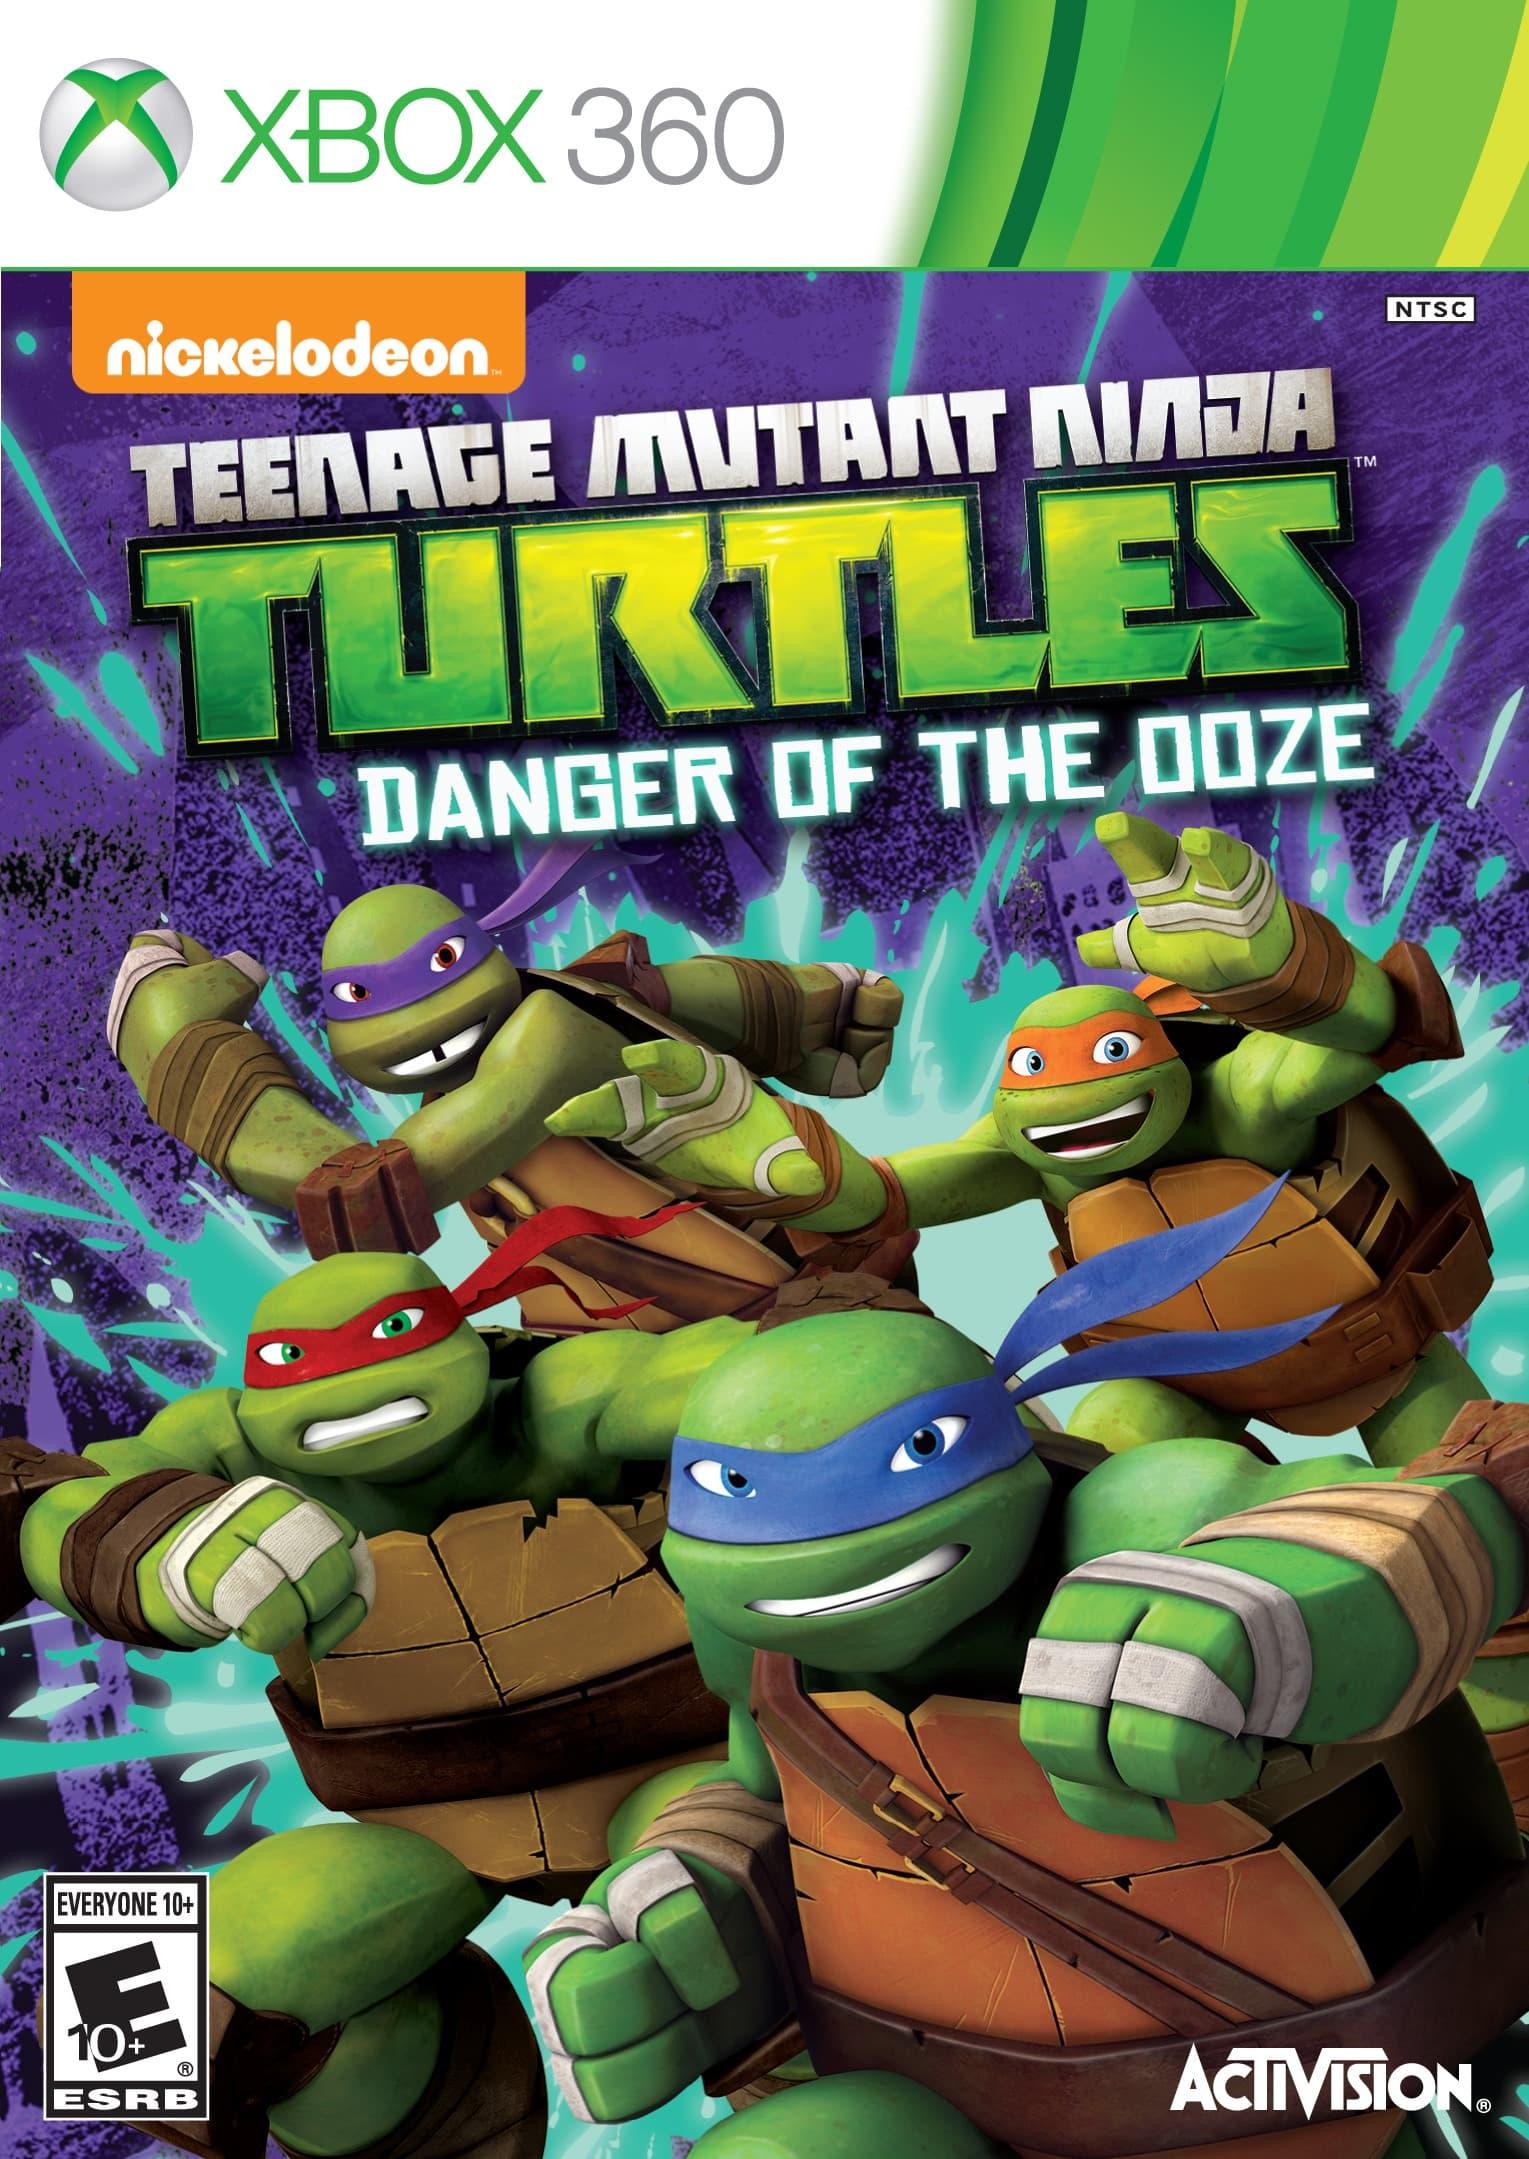 Jaquette Teenage Mutant Ninja Turtles: Danger of the Ooze